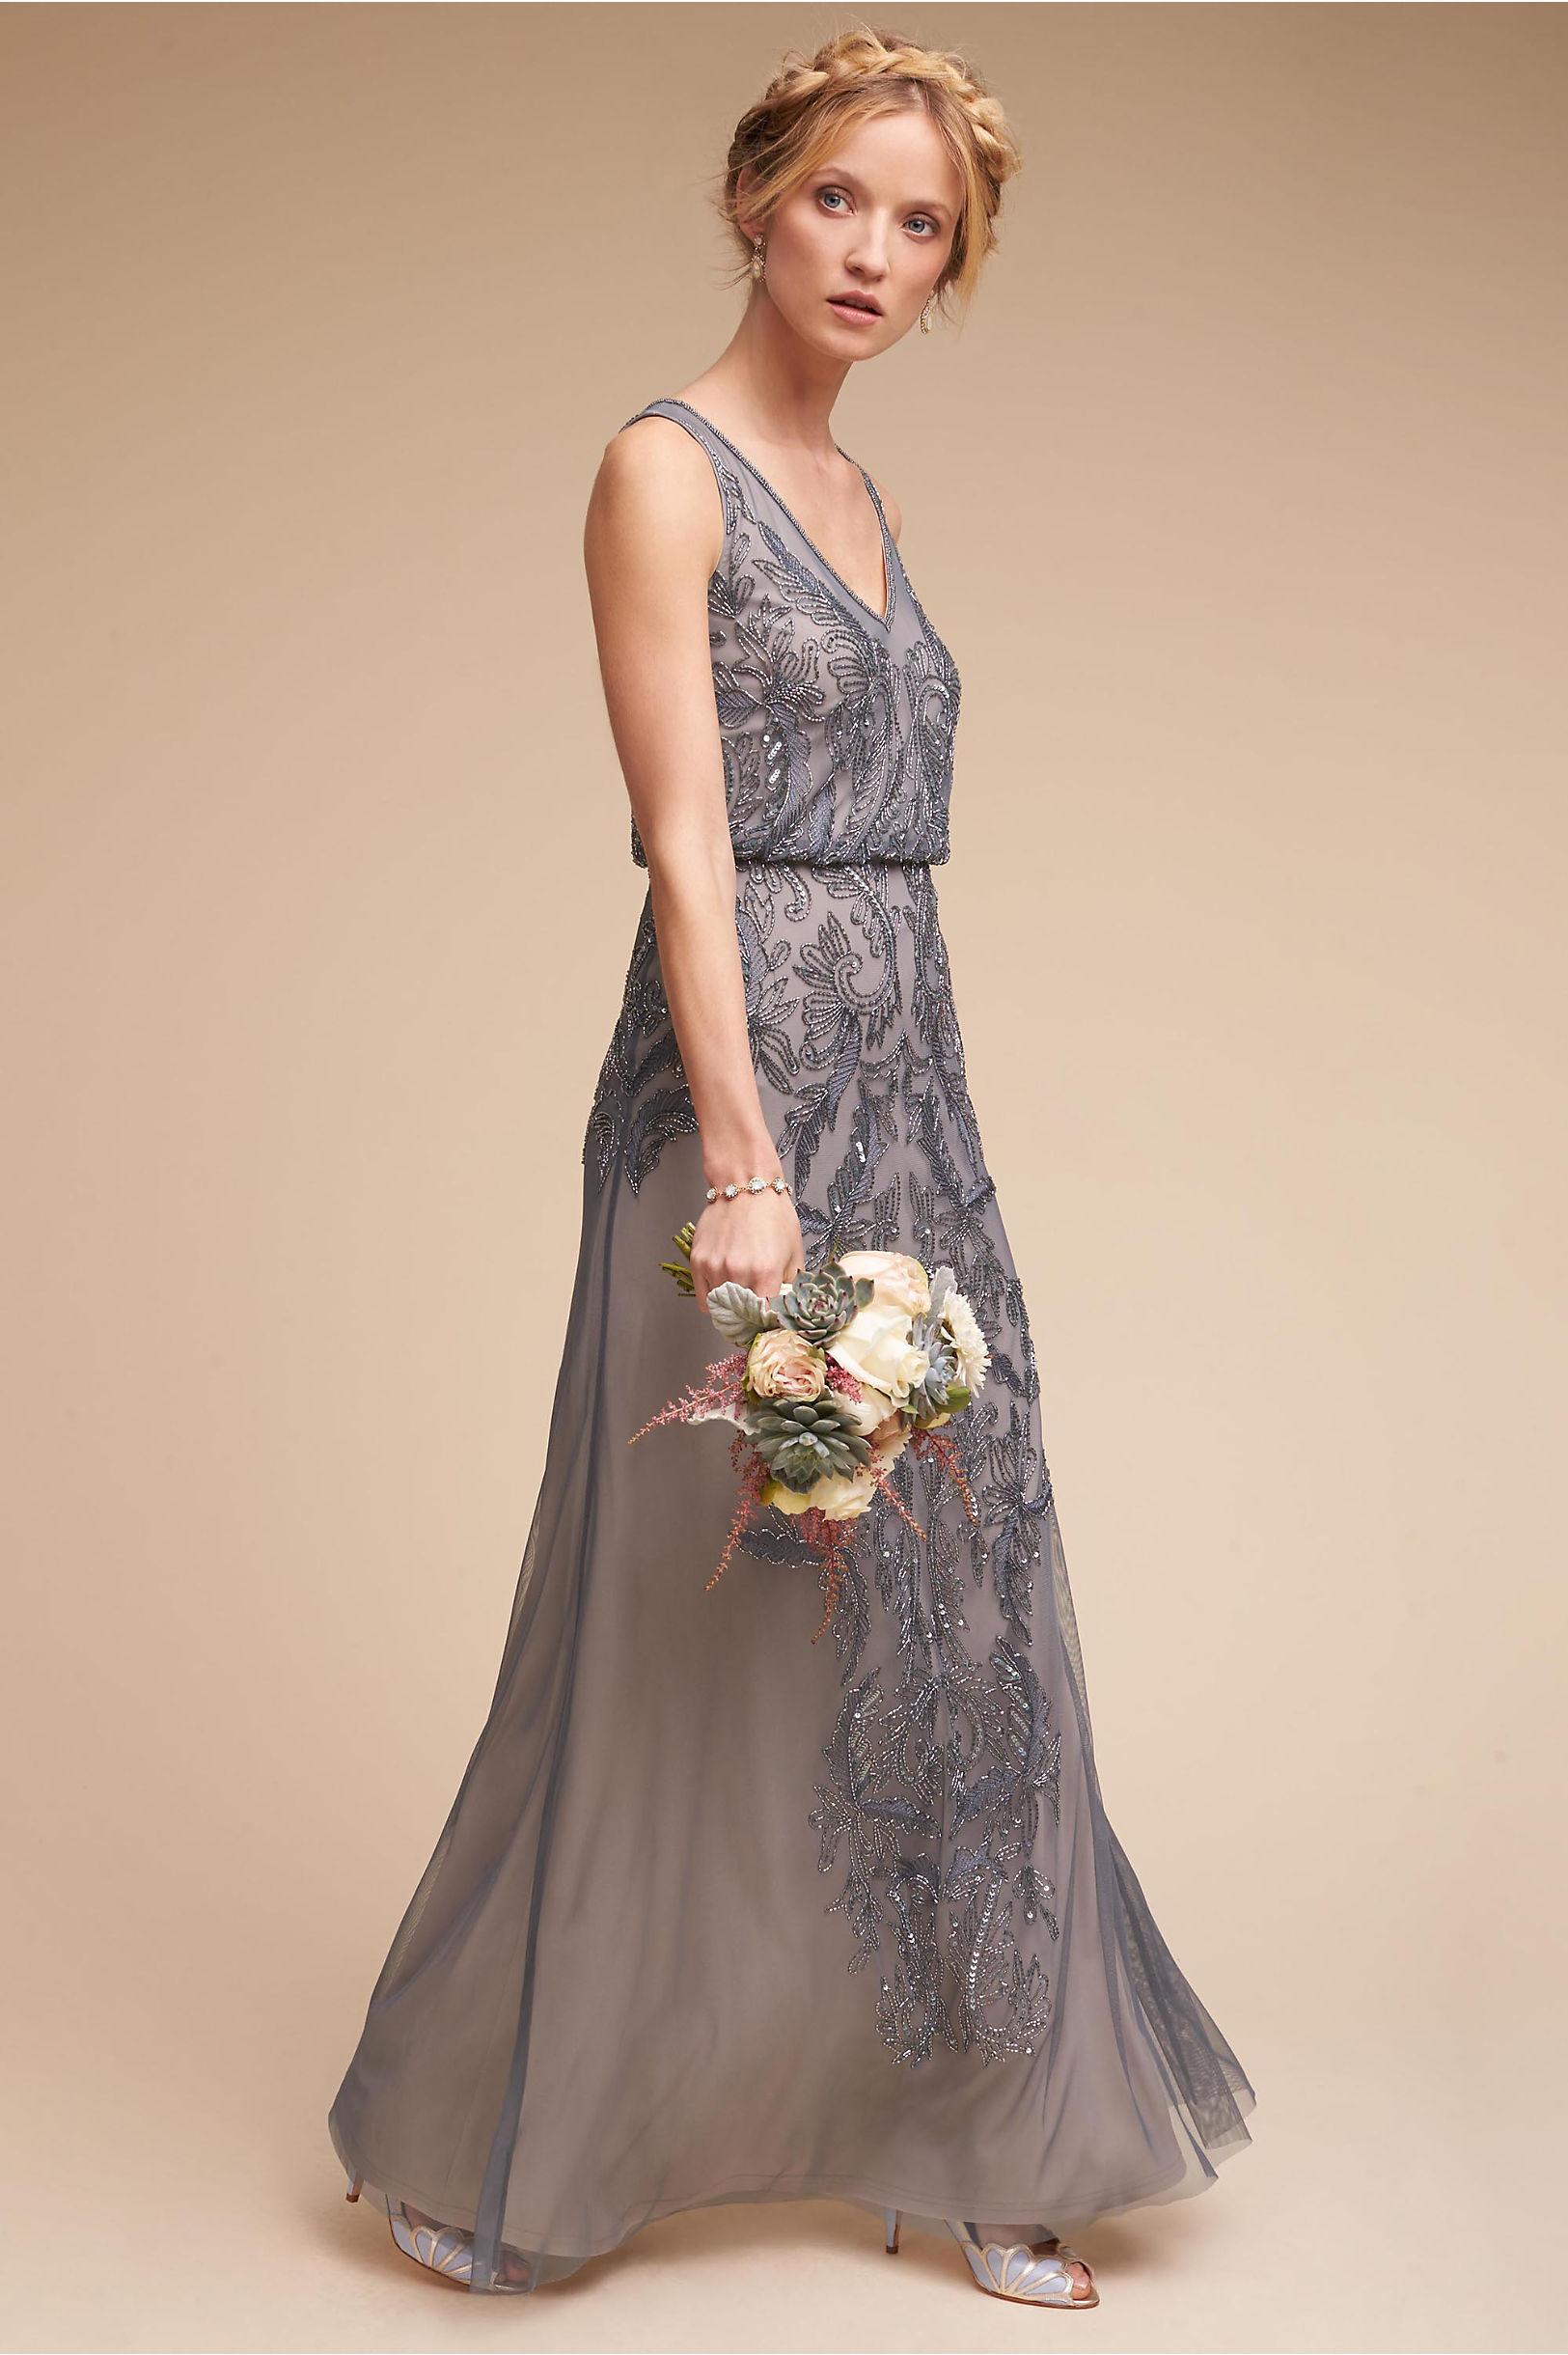 Aubrey dress in sale bhldn adrianna papell pewter aubrey dress bhldn ombrellifo Image collections